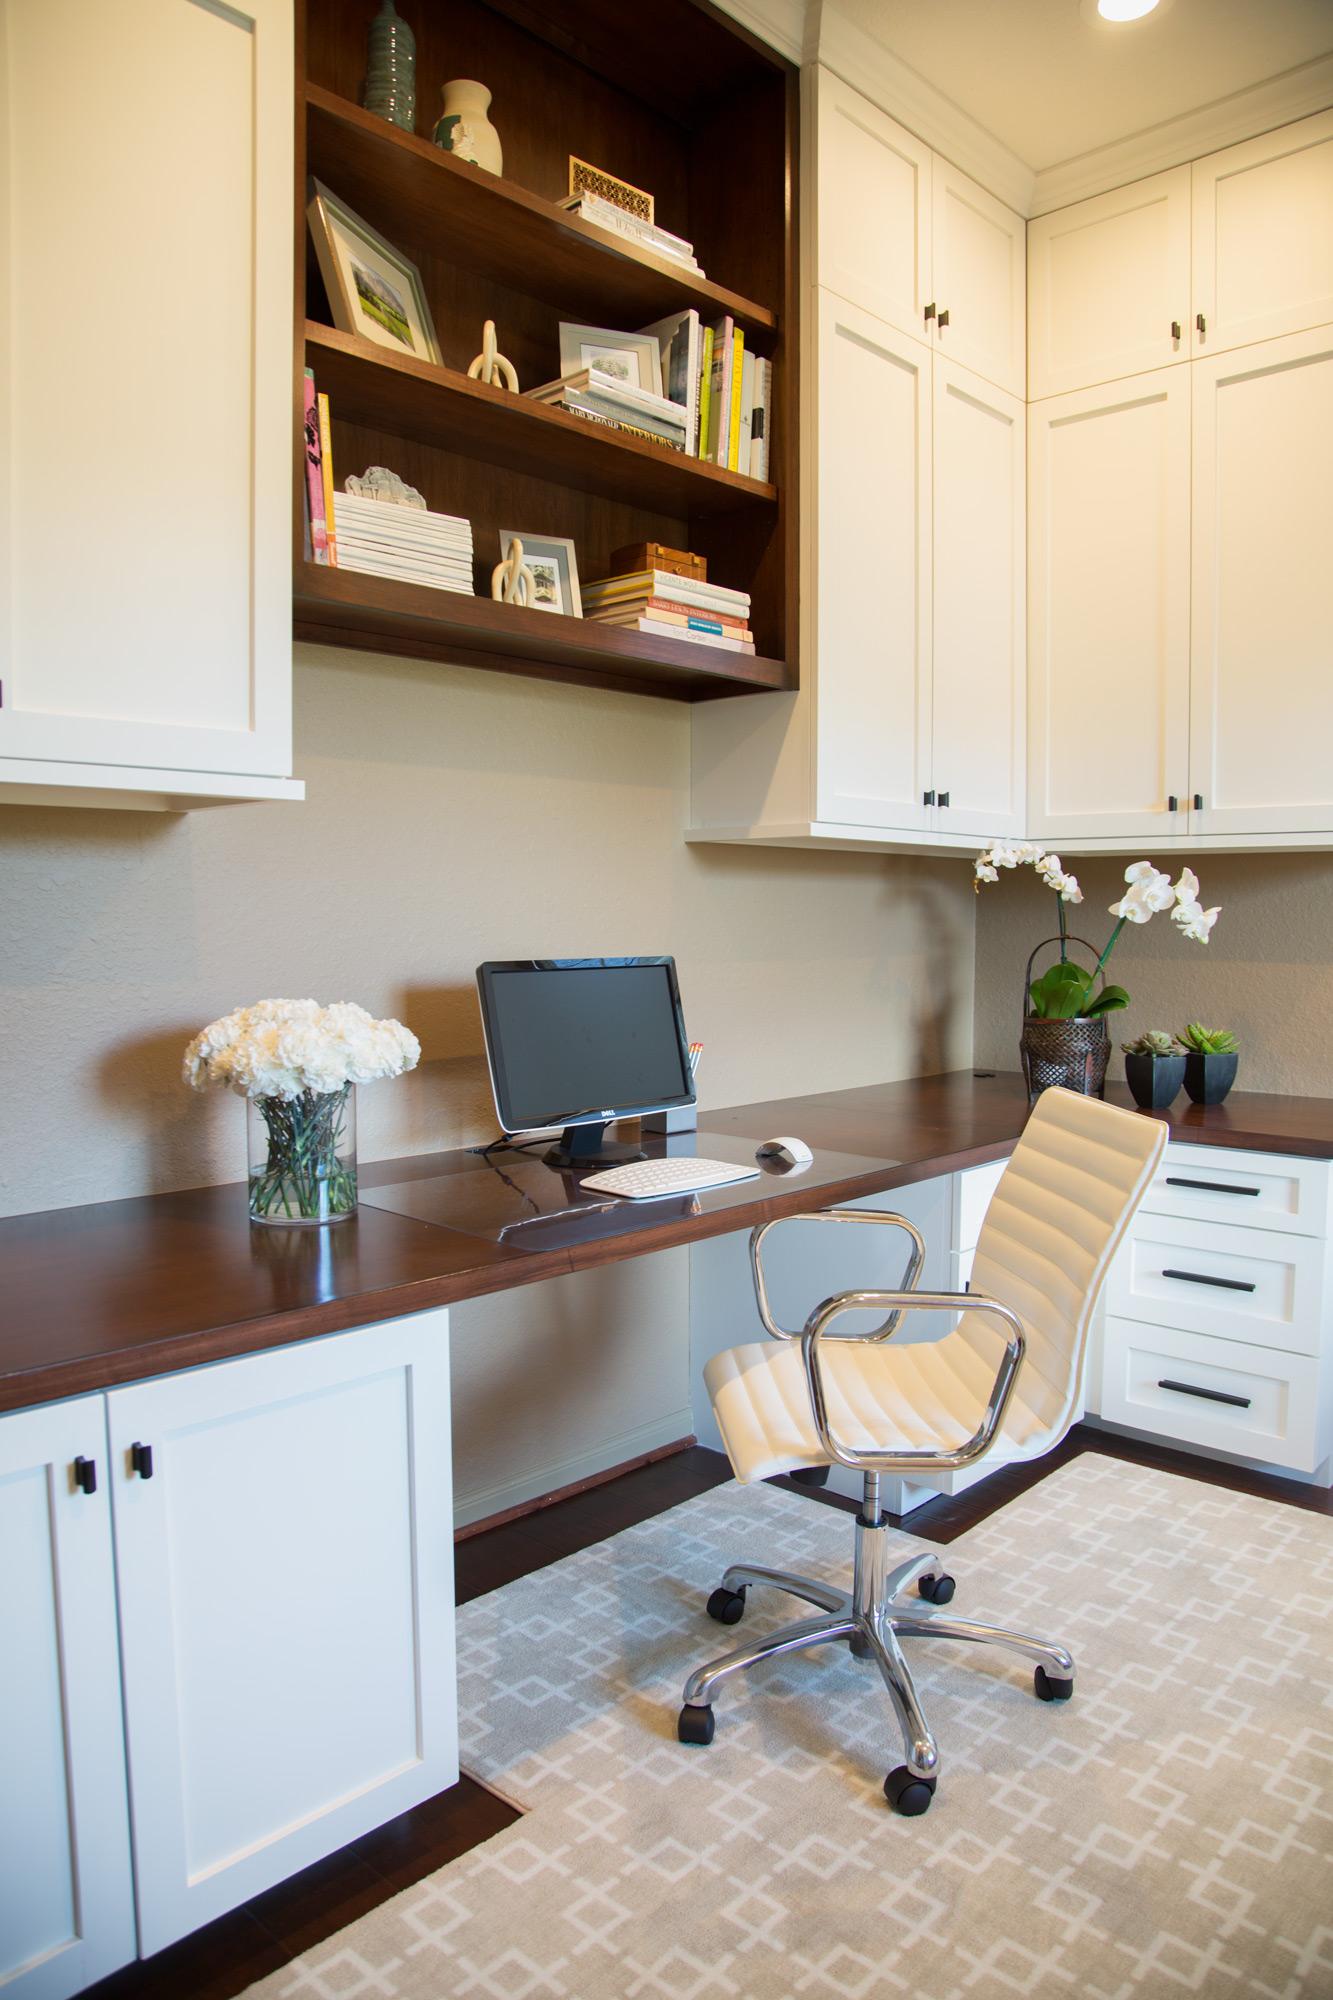 Designer: Carla Aston, Home Office w/ custom rug cut to fit desk area